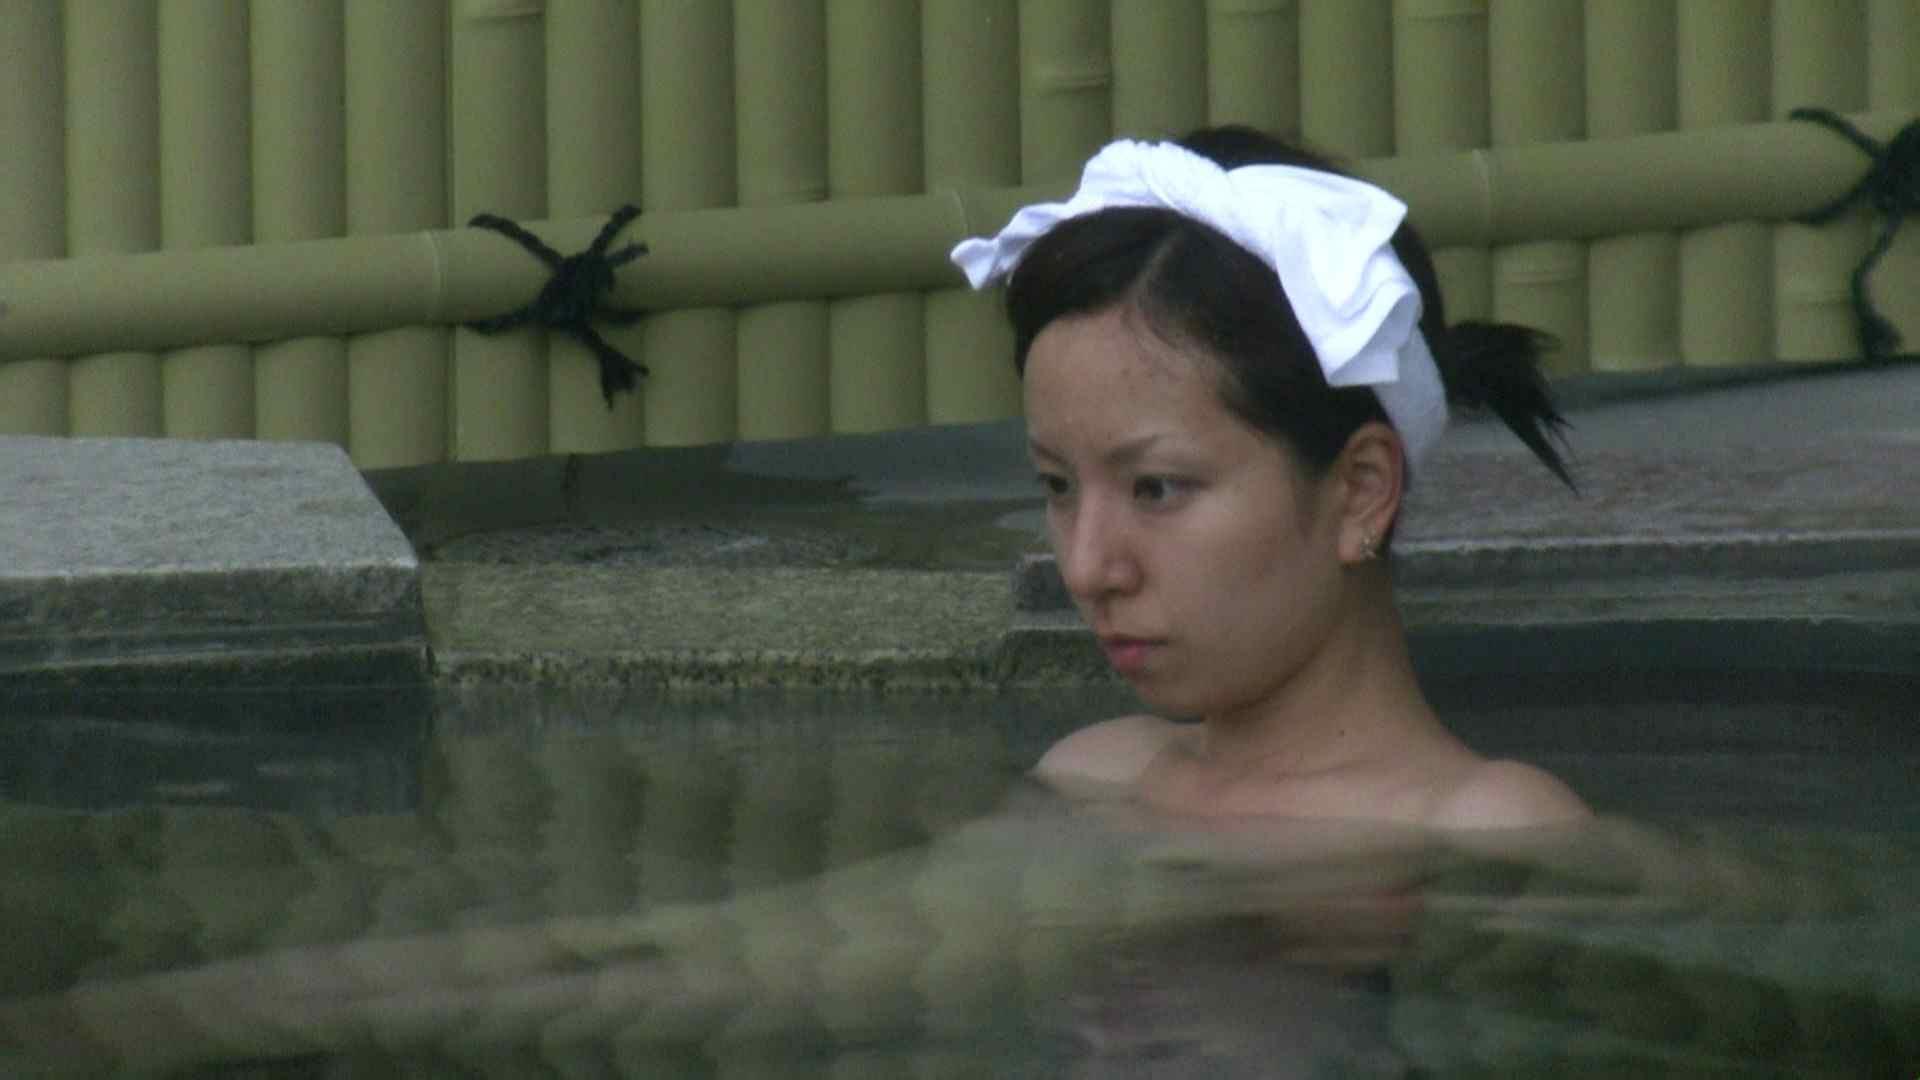 Aquaな露天風呂Vol.39【VIP】 綺麗なOLたち オマンコ動画キャプチャ 111枚 107